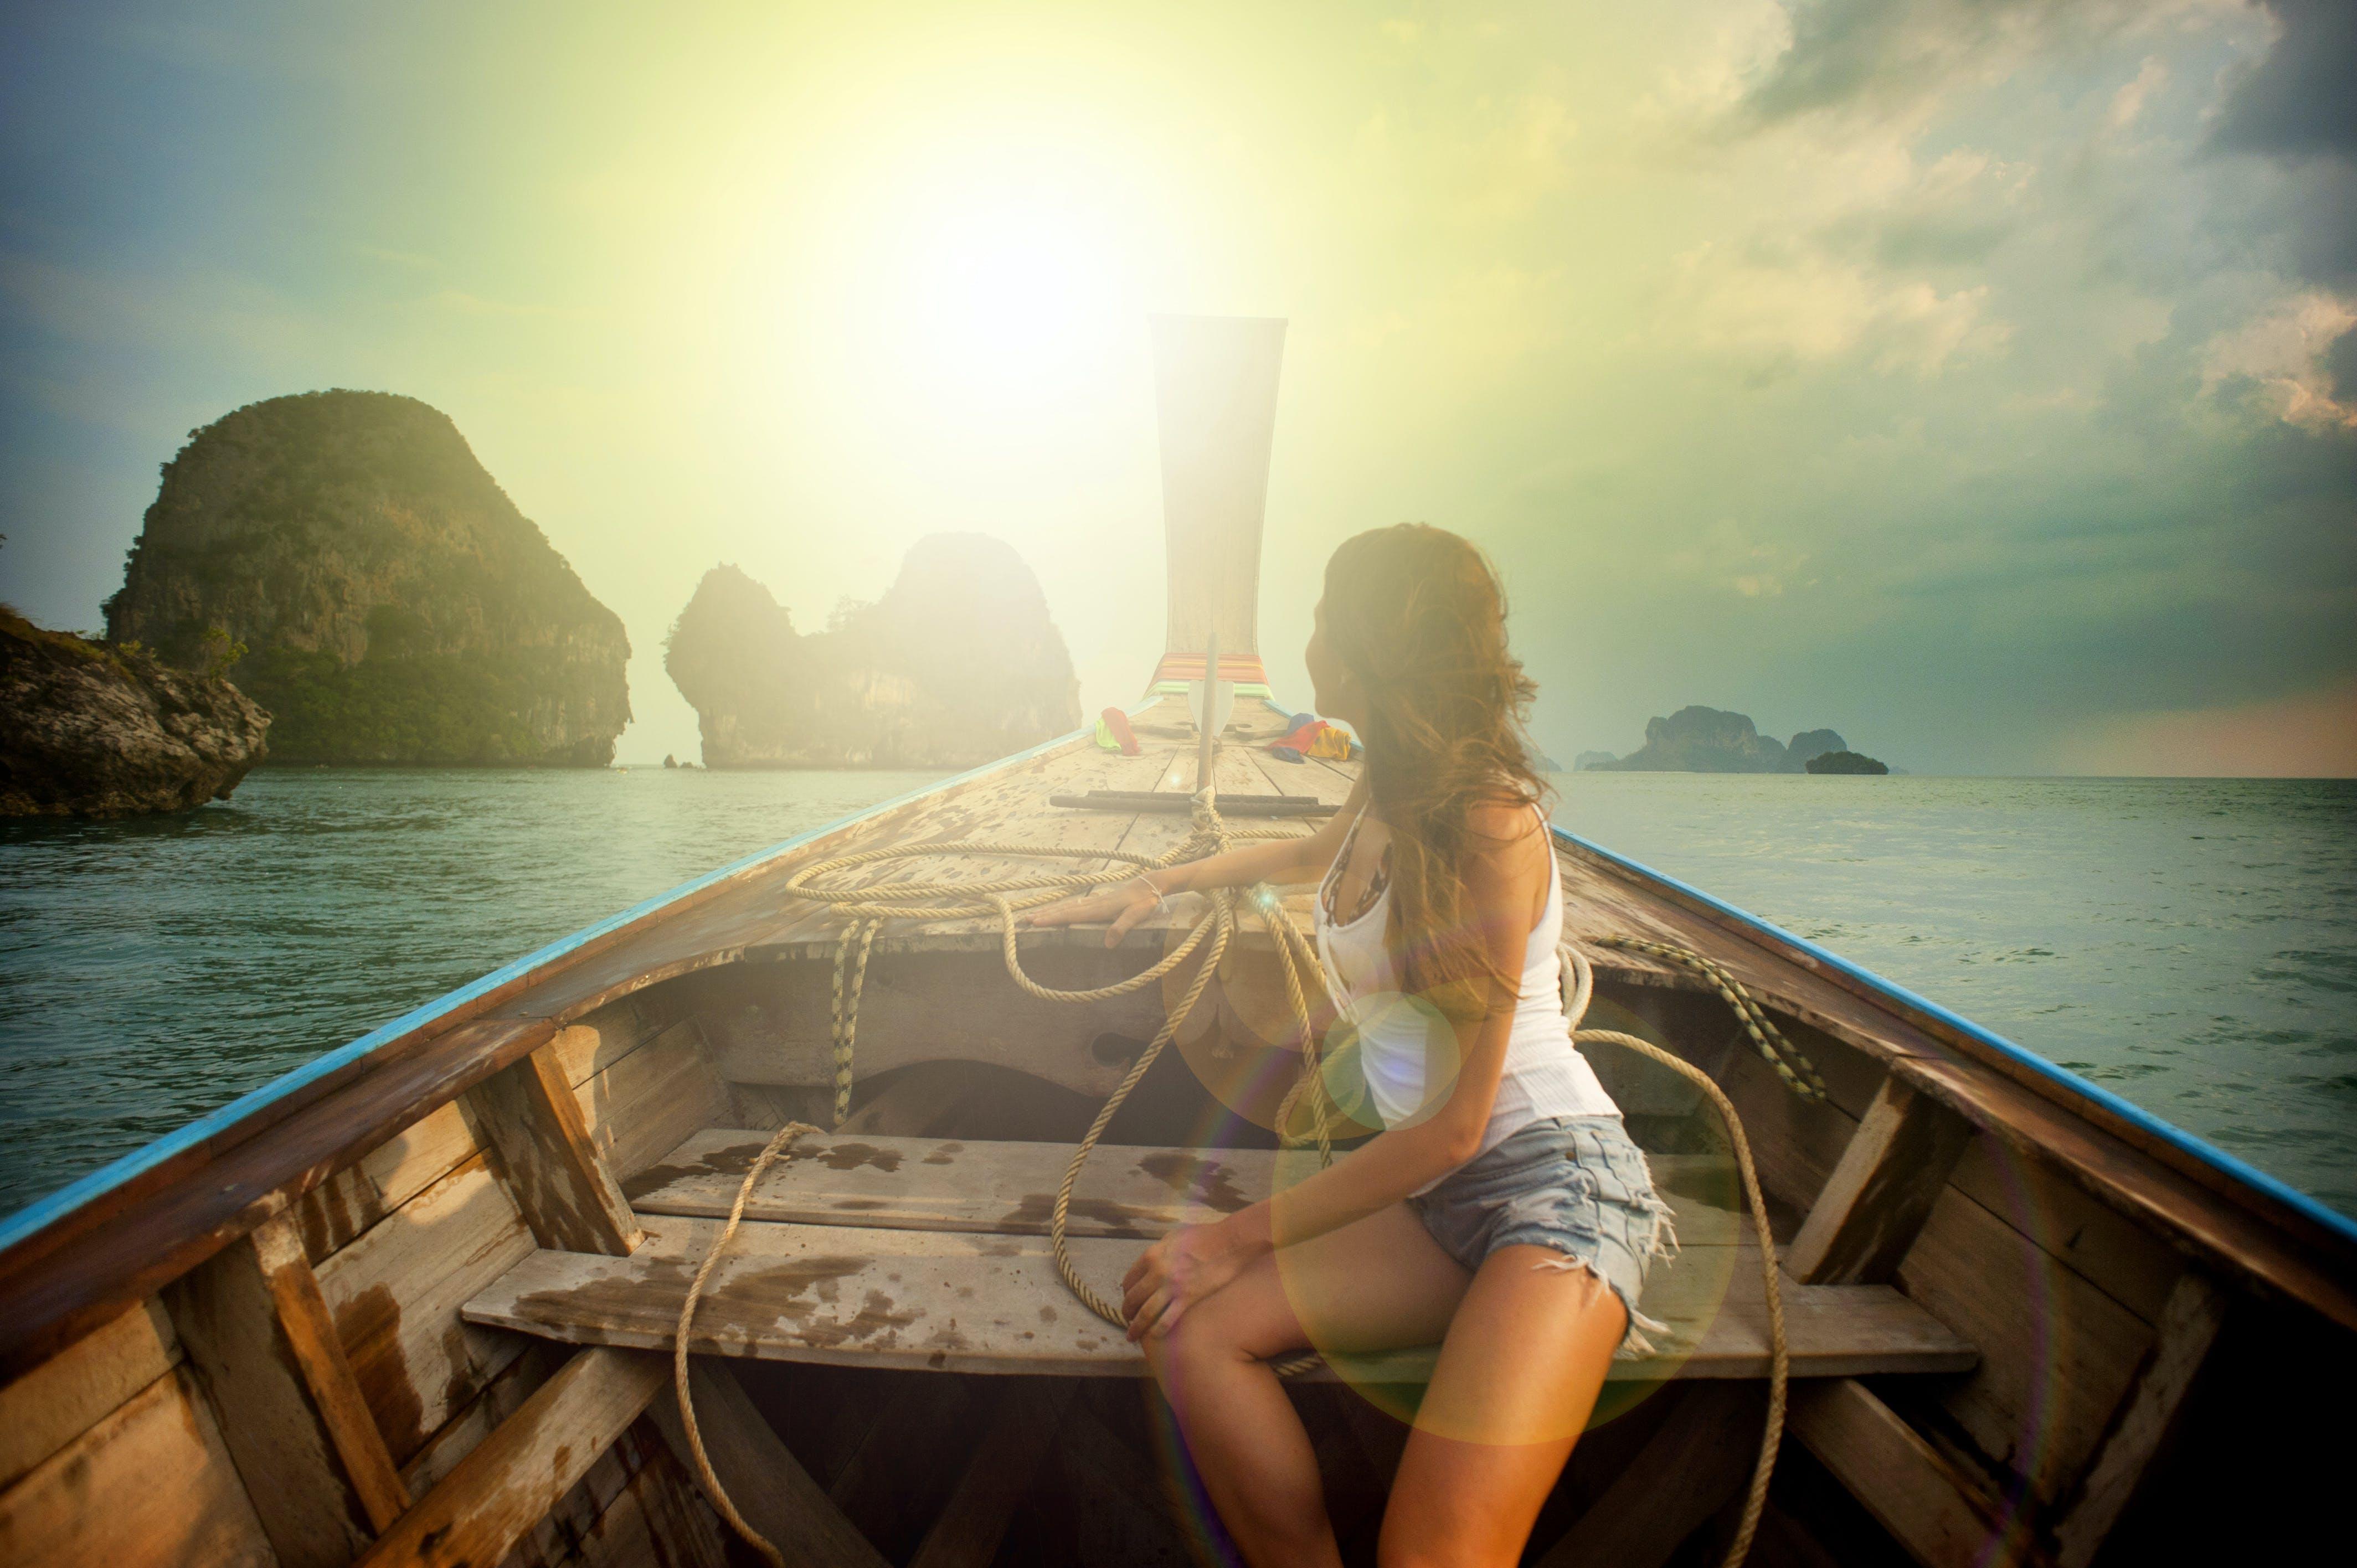 Woman Wearing White Tank Top Seating on Boat